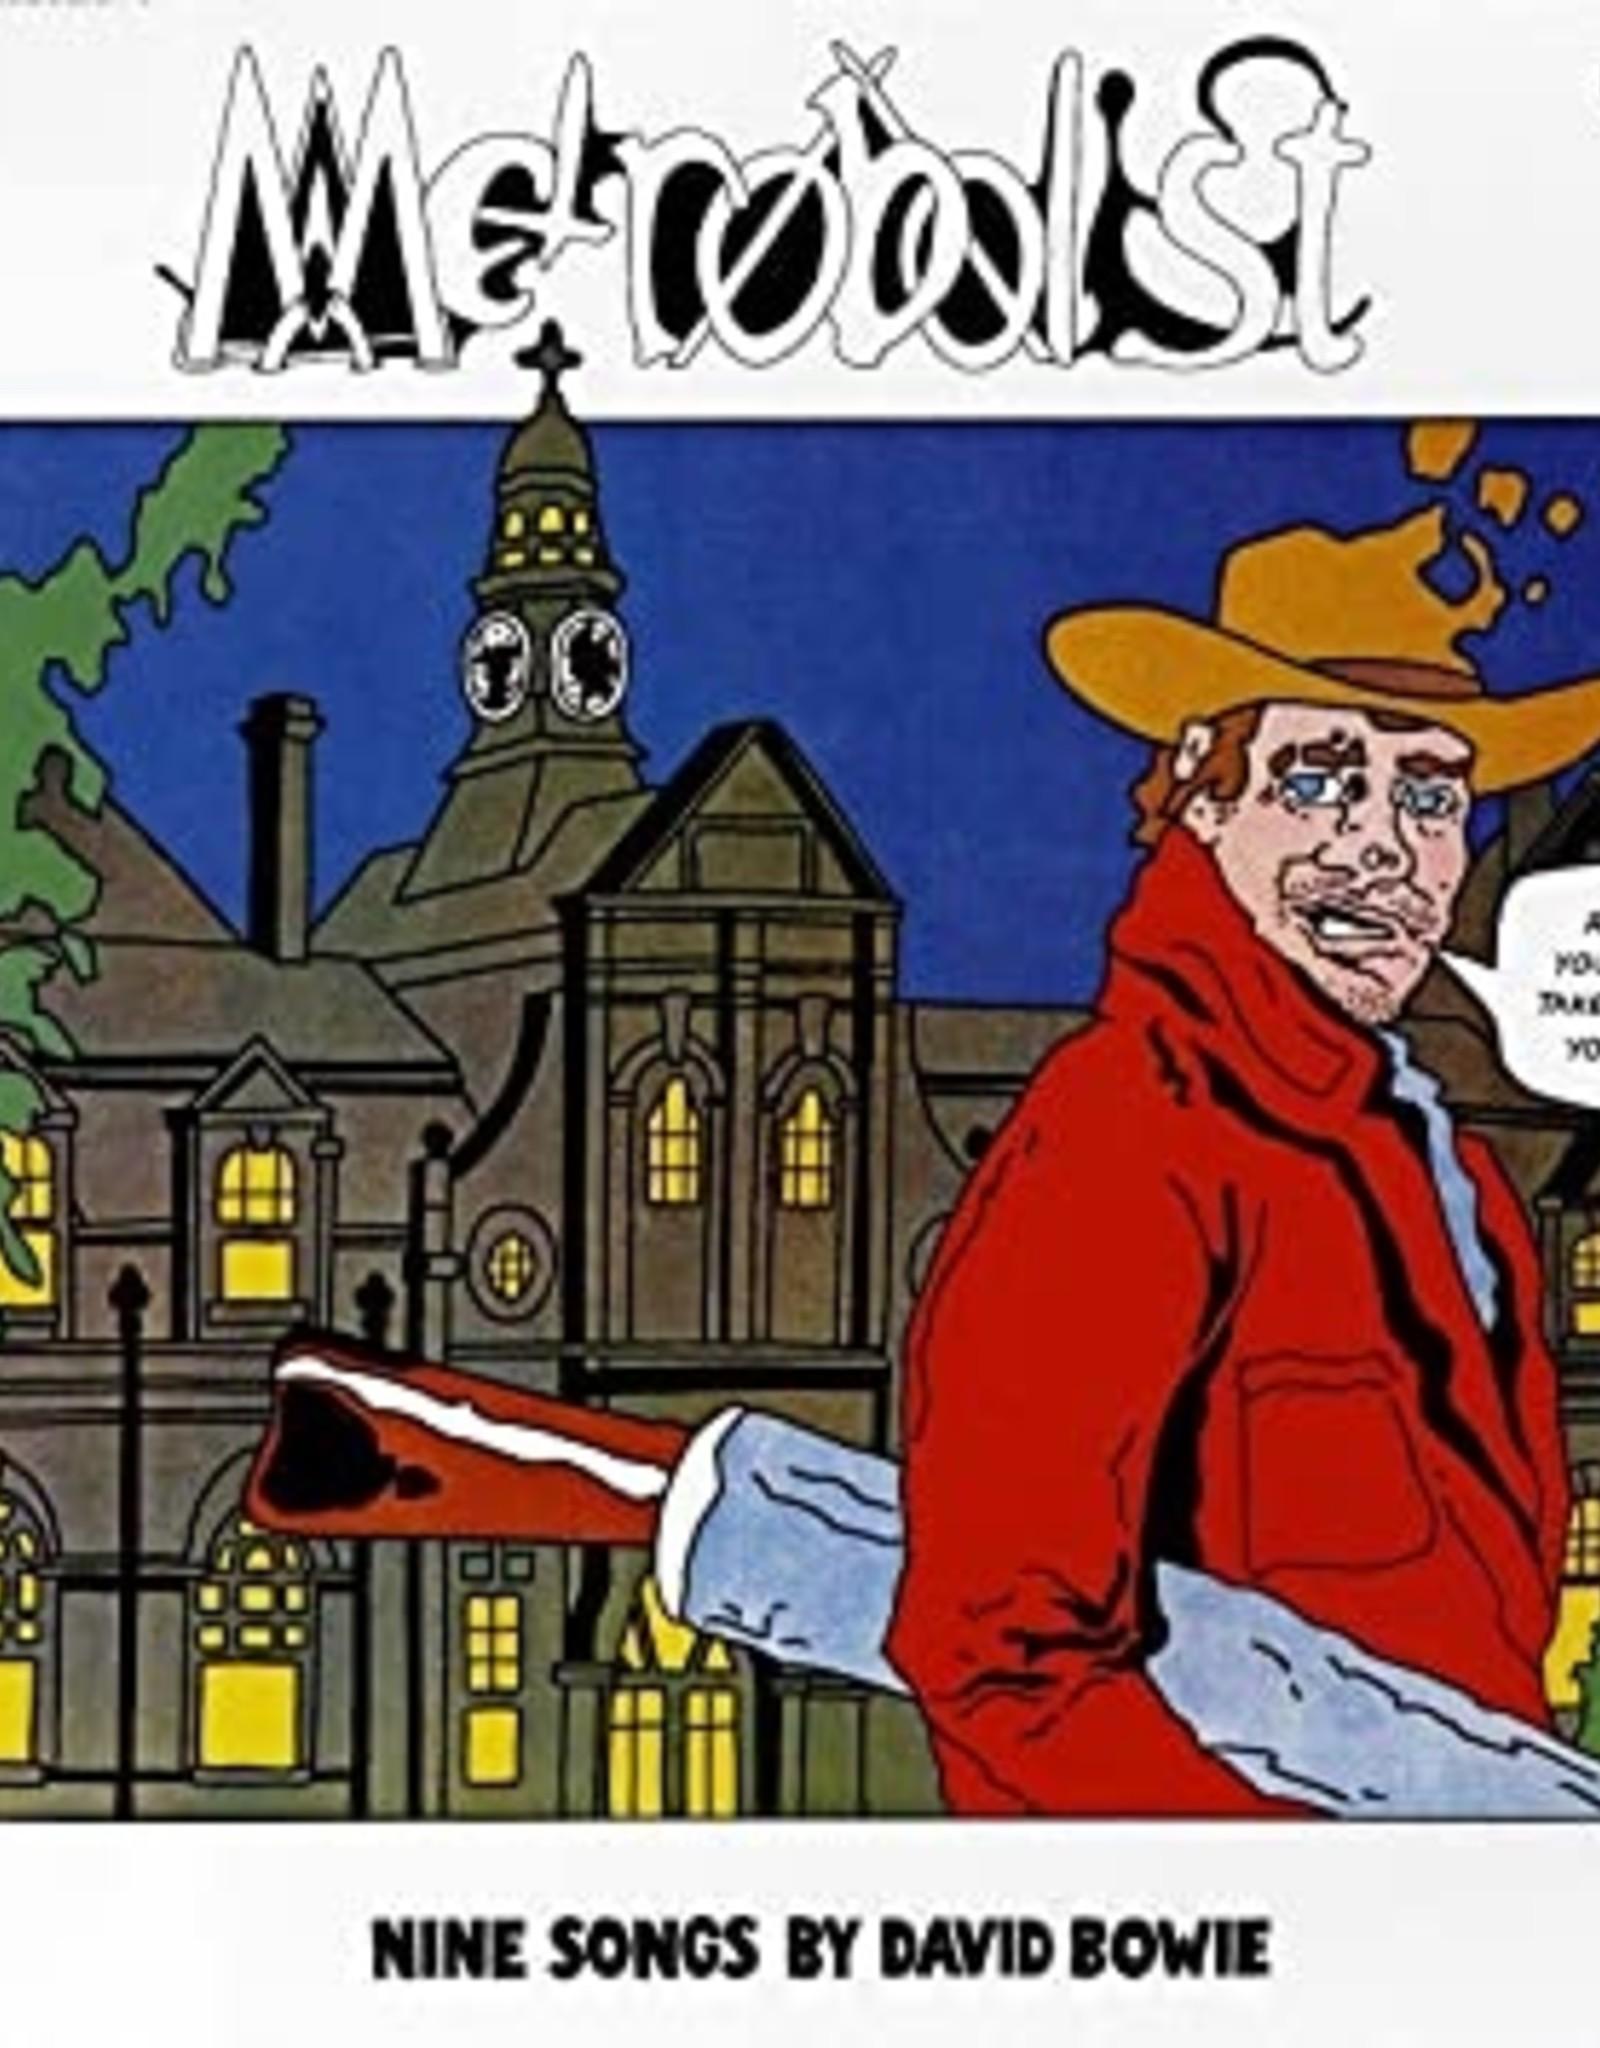 David Bowie - Metrobolit (aka Man Who Sold the World)